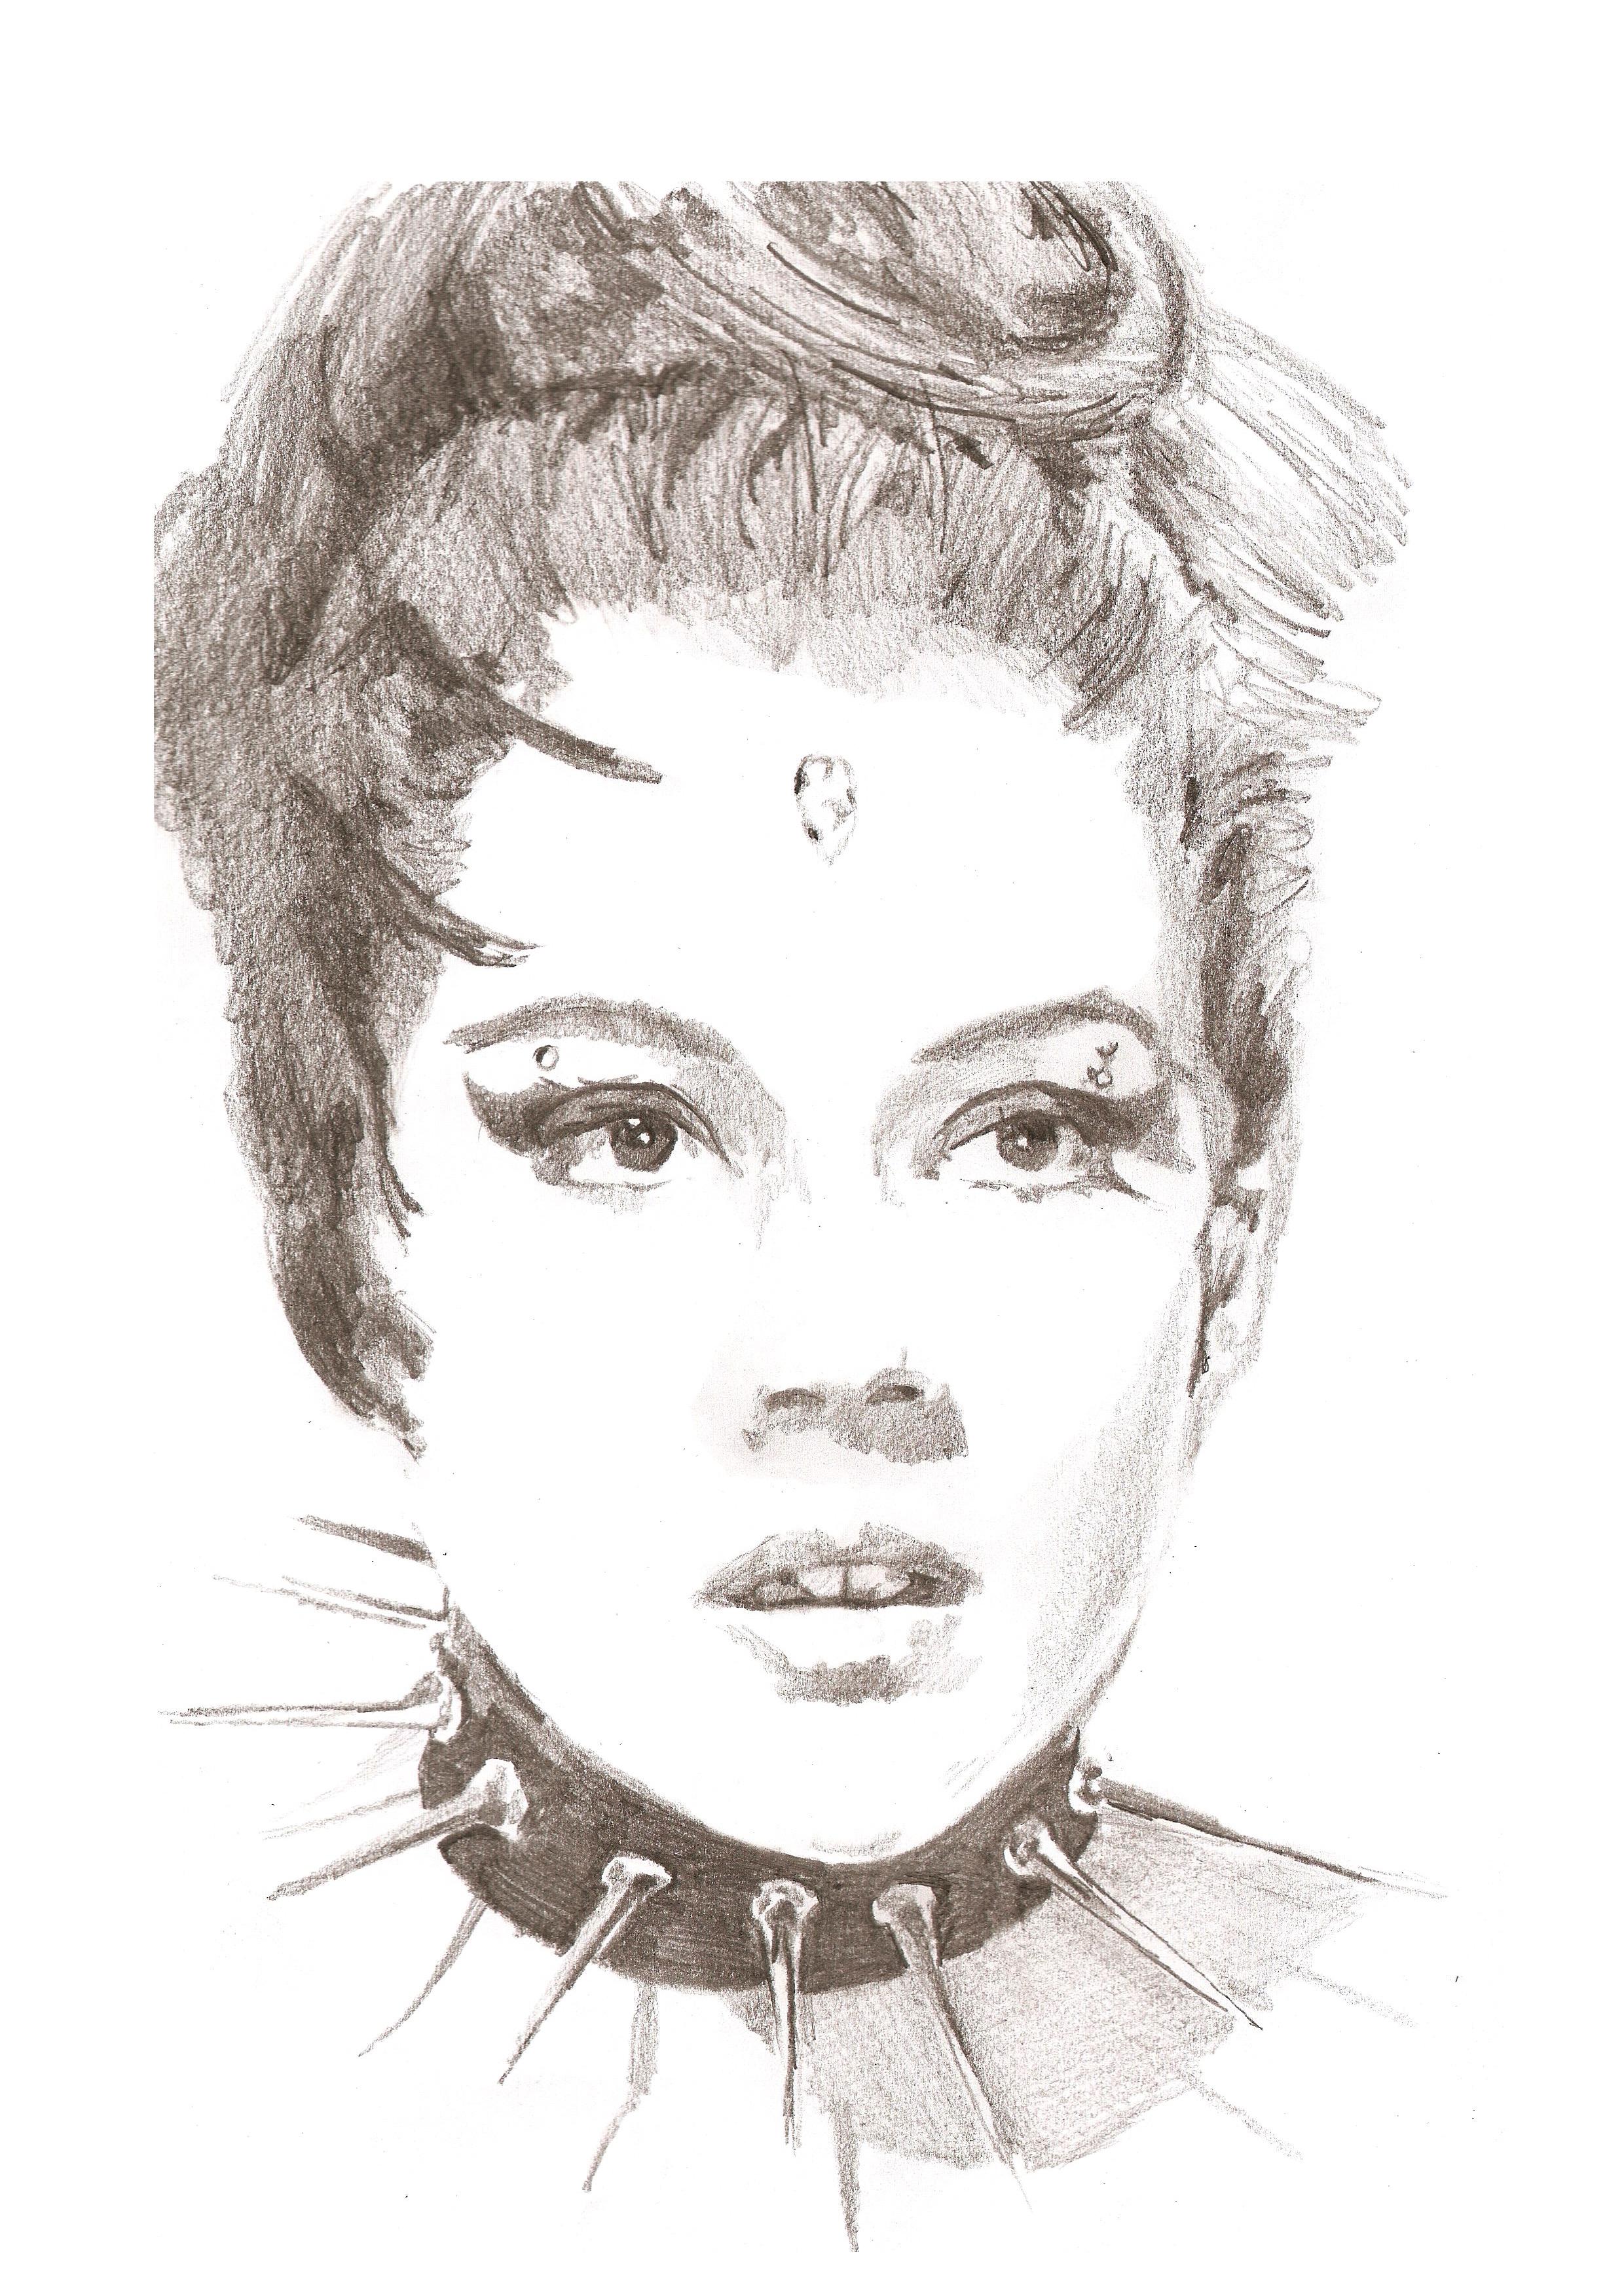 Diana Rigg as the Black Queen